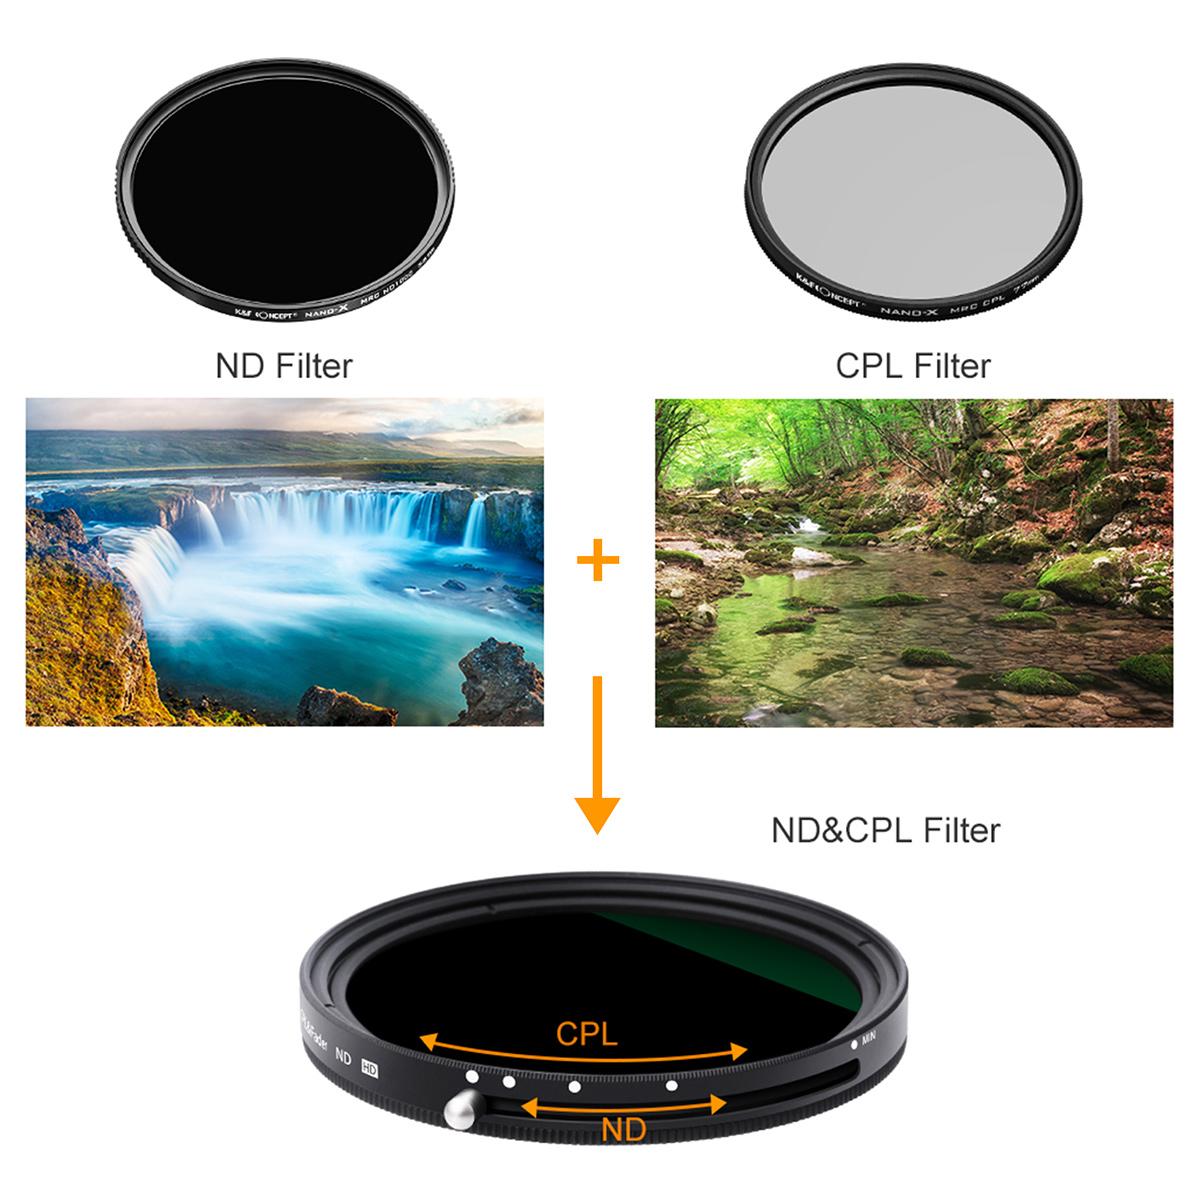 K&F Concept バリアブルND + C-PL 多機能フィルター NANO-X 2IN1シリーズ